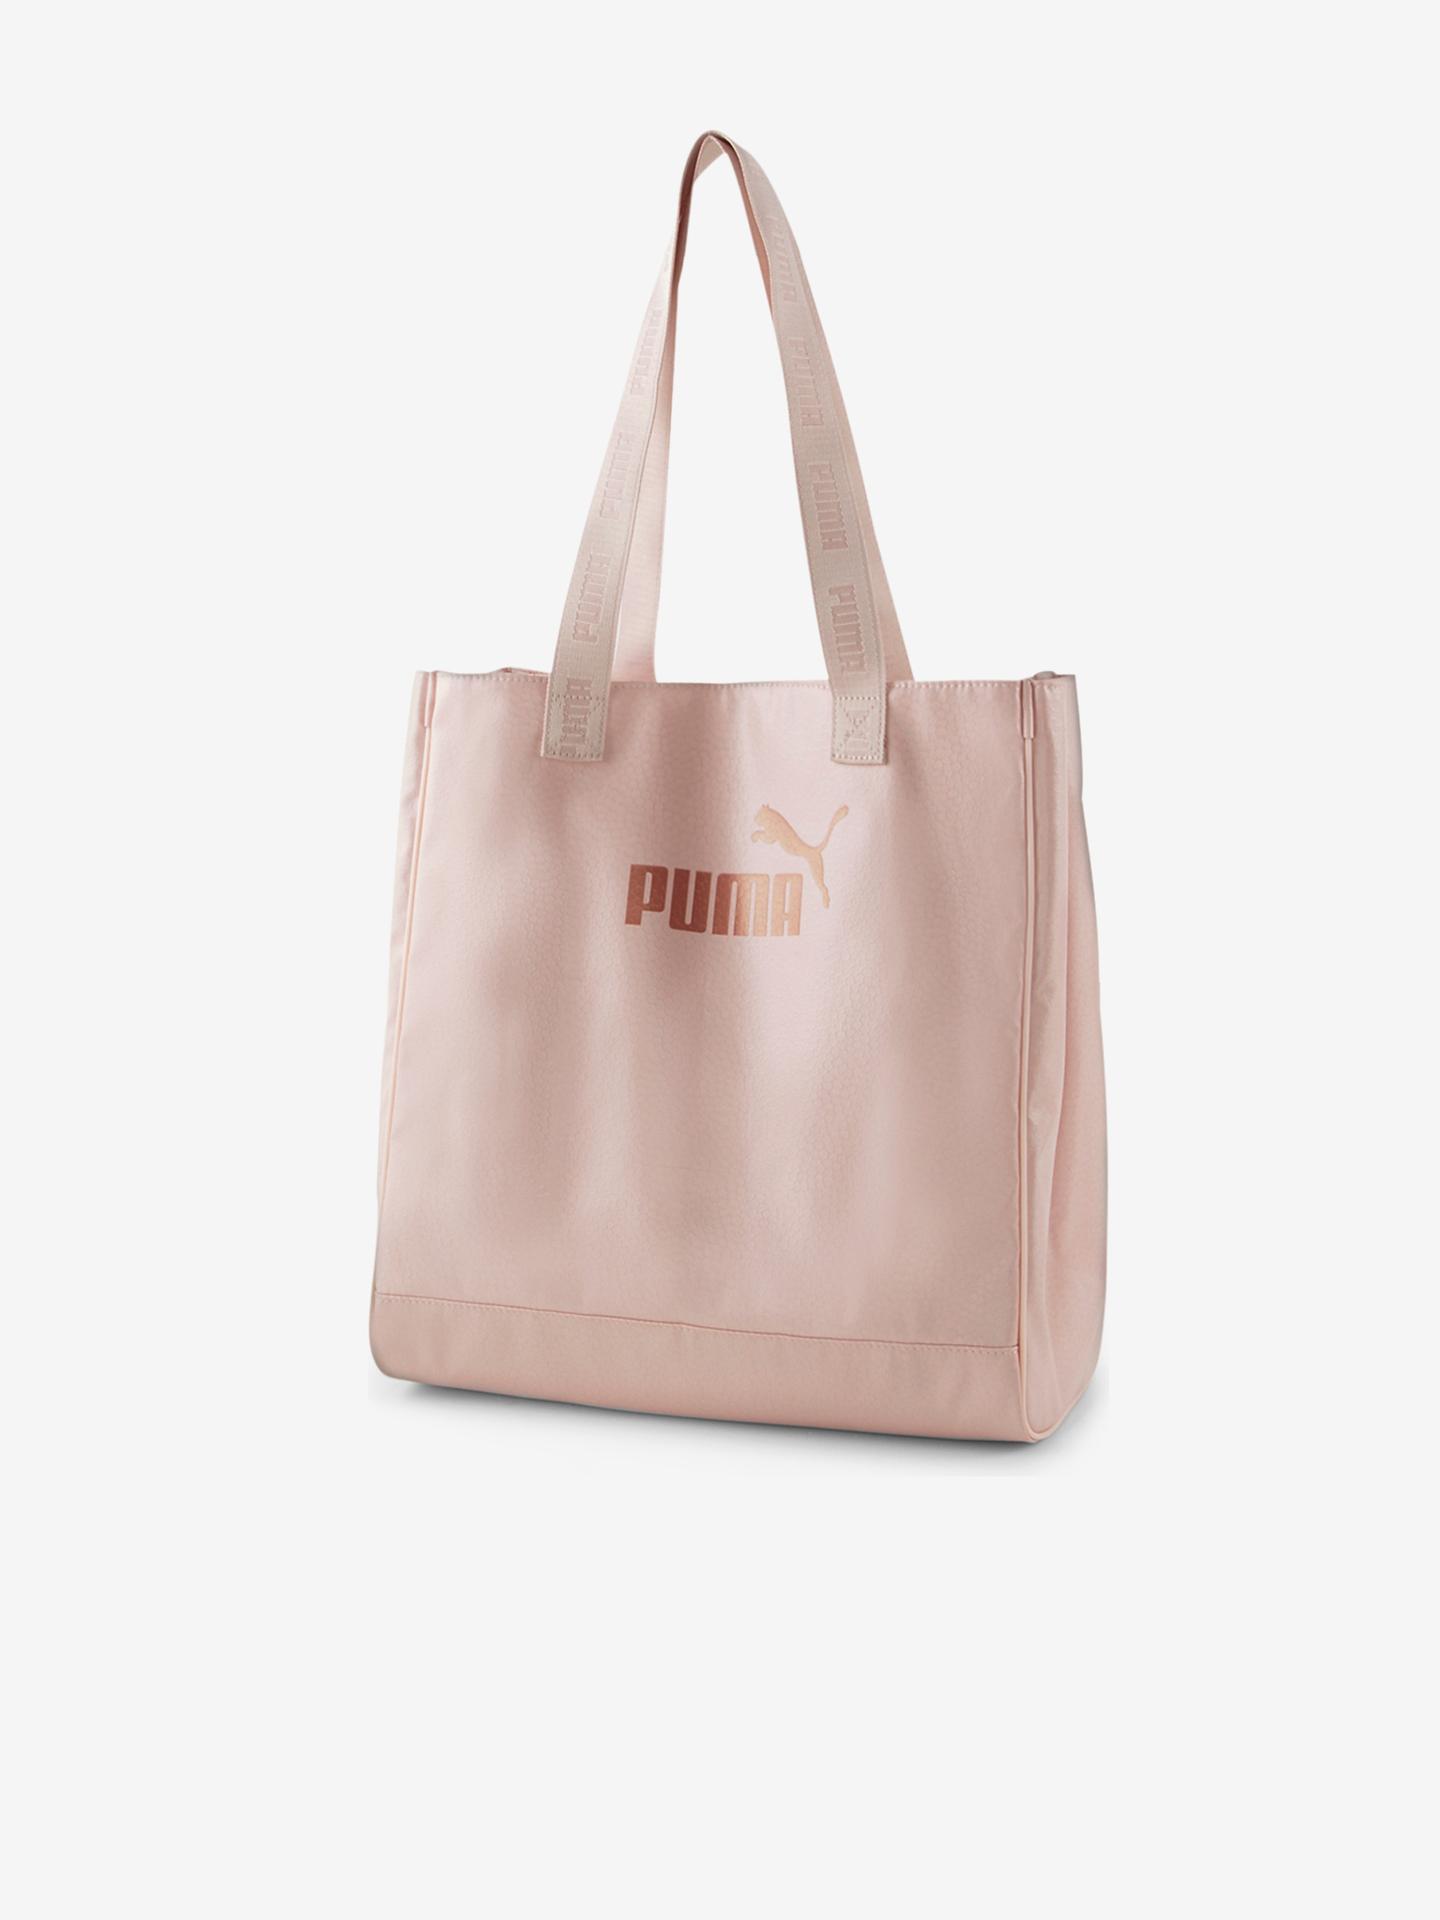 Puma Torebka damska różowy